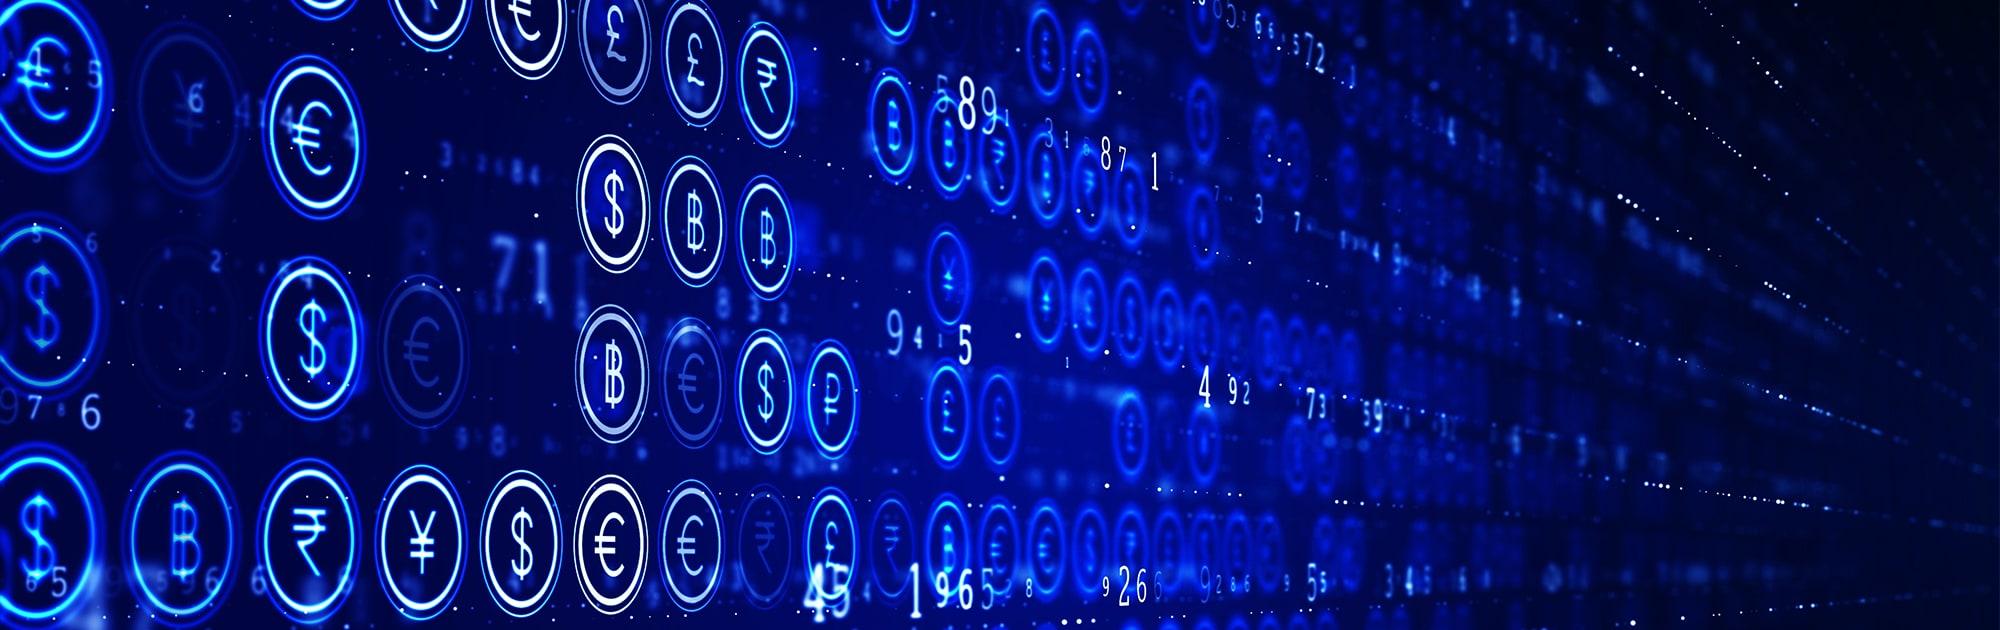 Banner of digital currencies